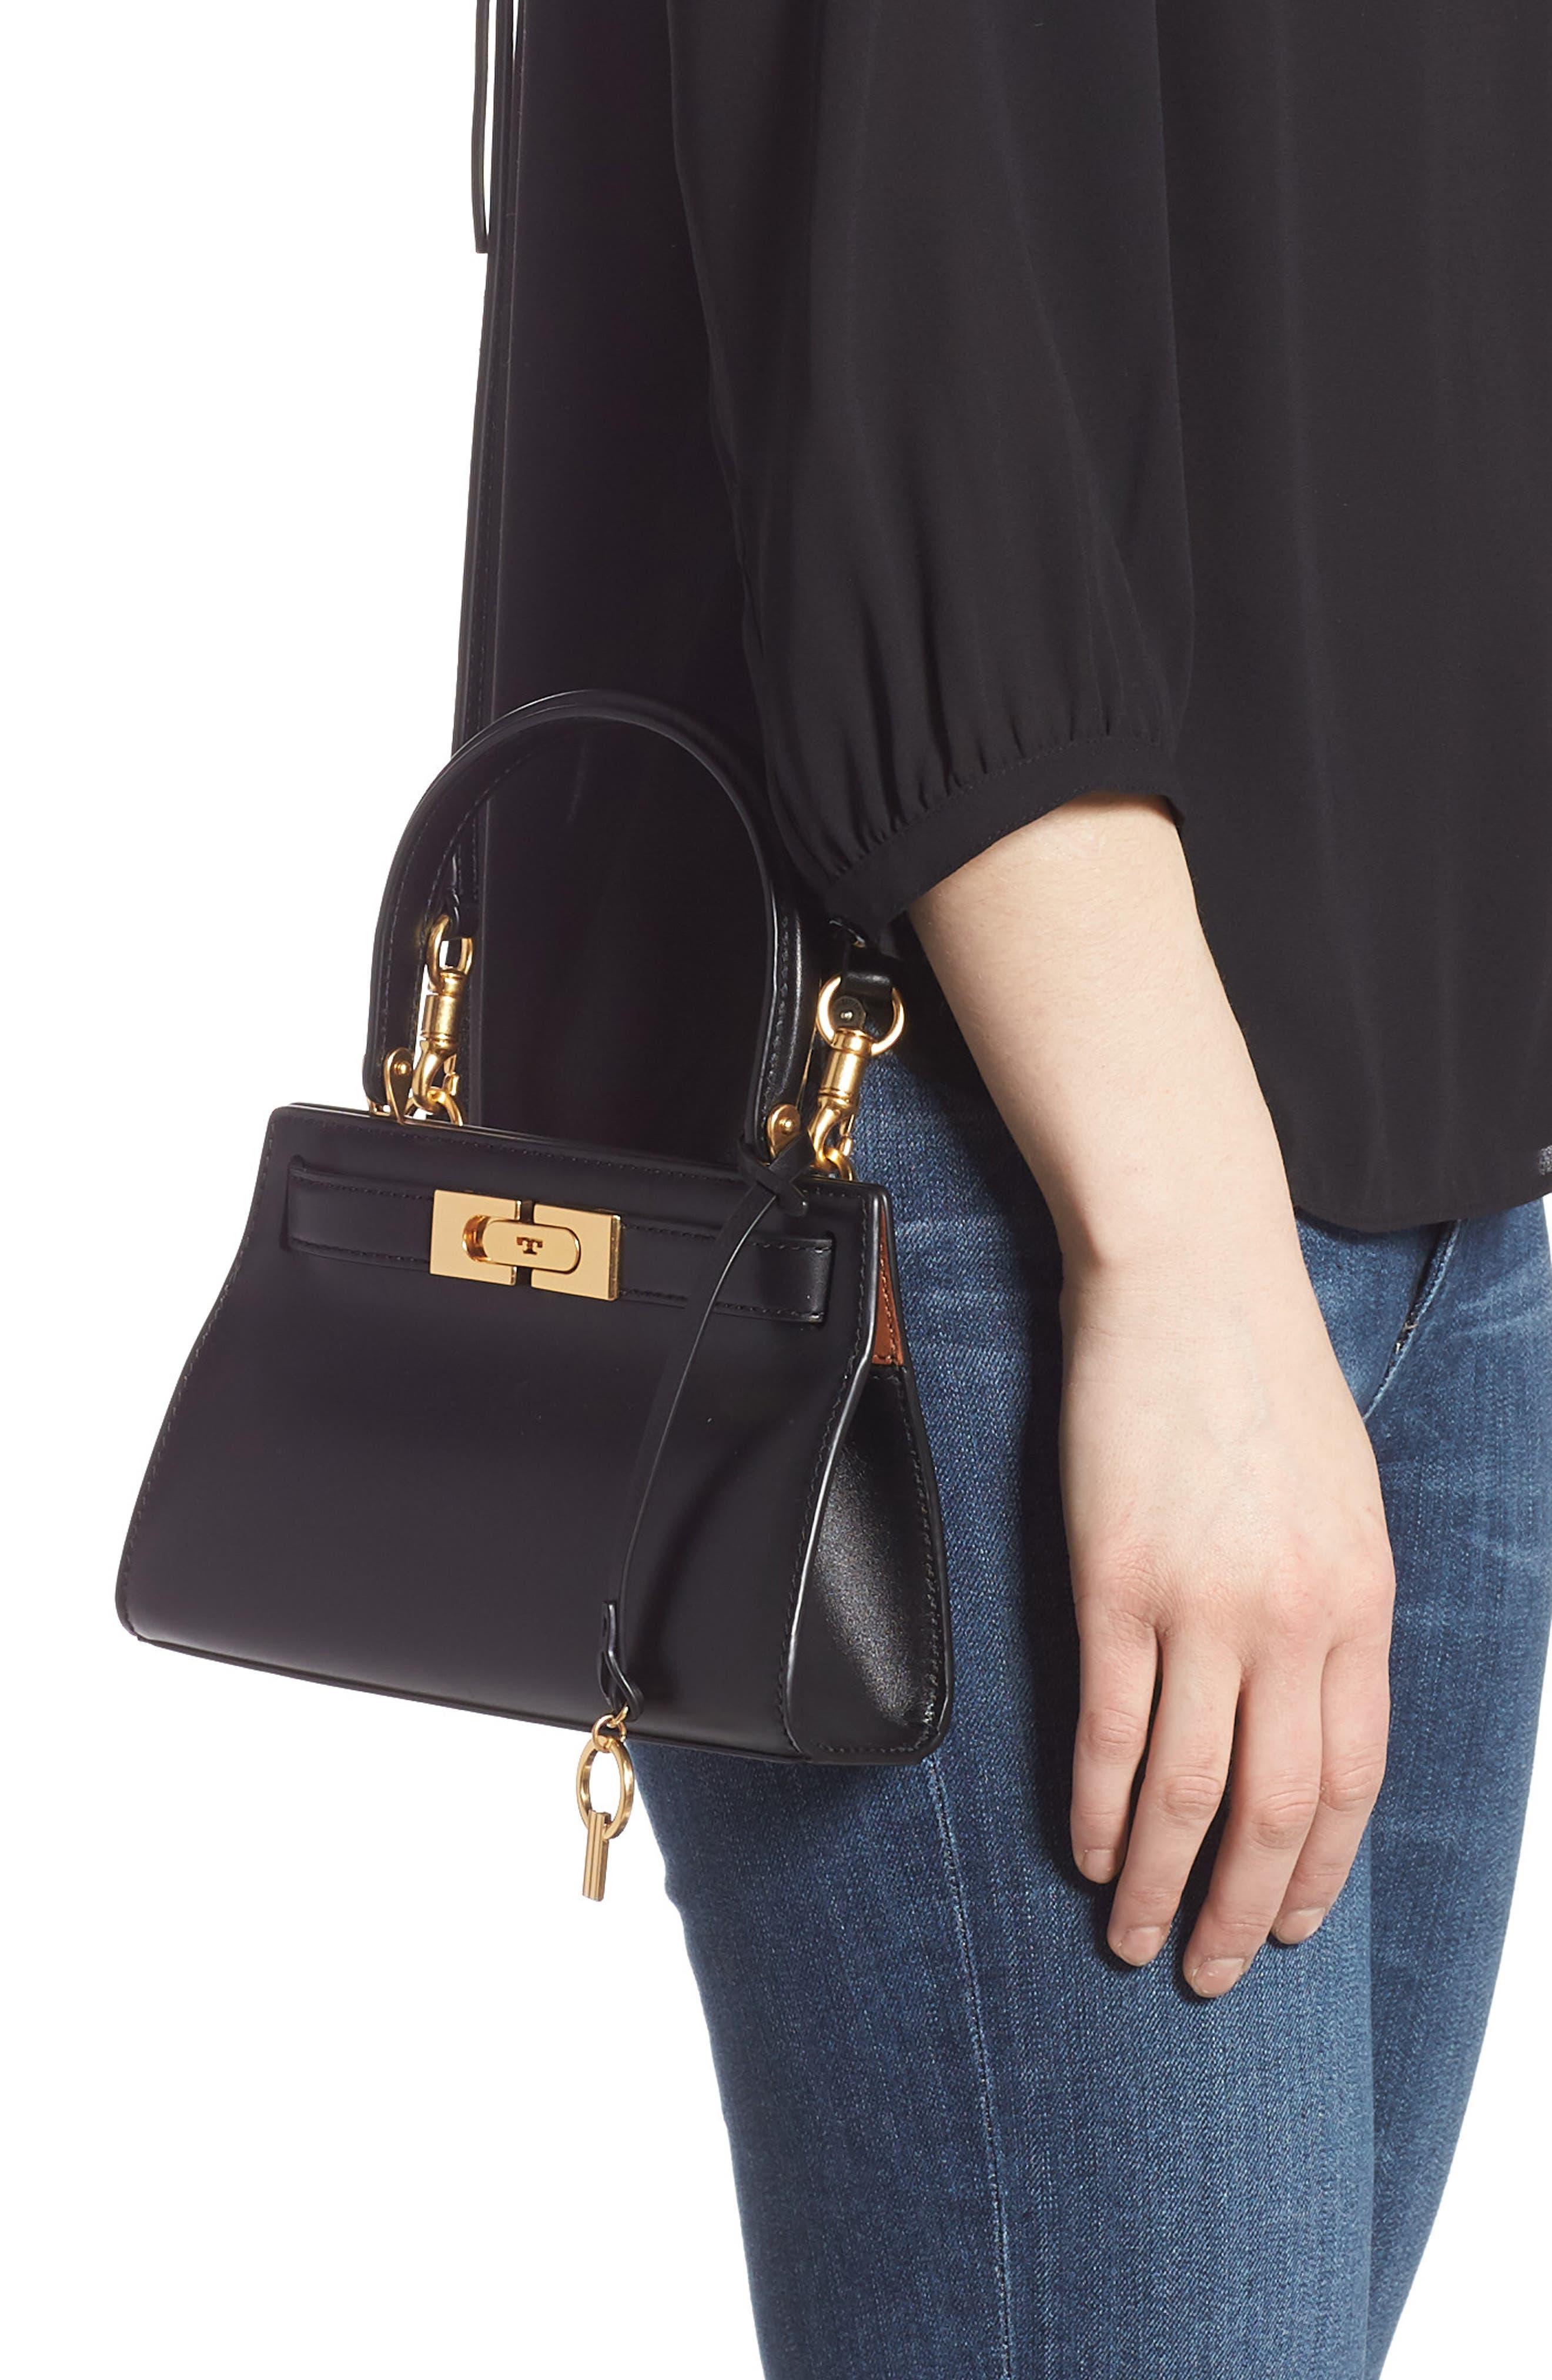 TORY BURCH, Mini Lee Radziwill Leather Bag, Alternate thumbnail 2, color, BLACK